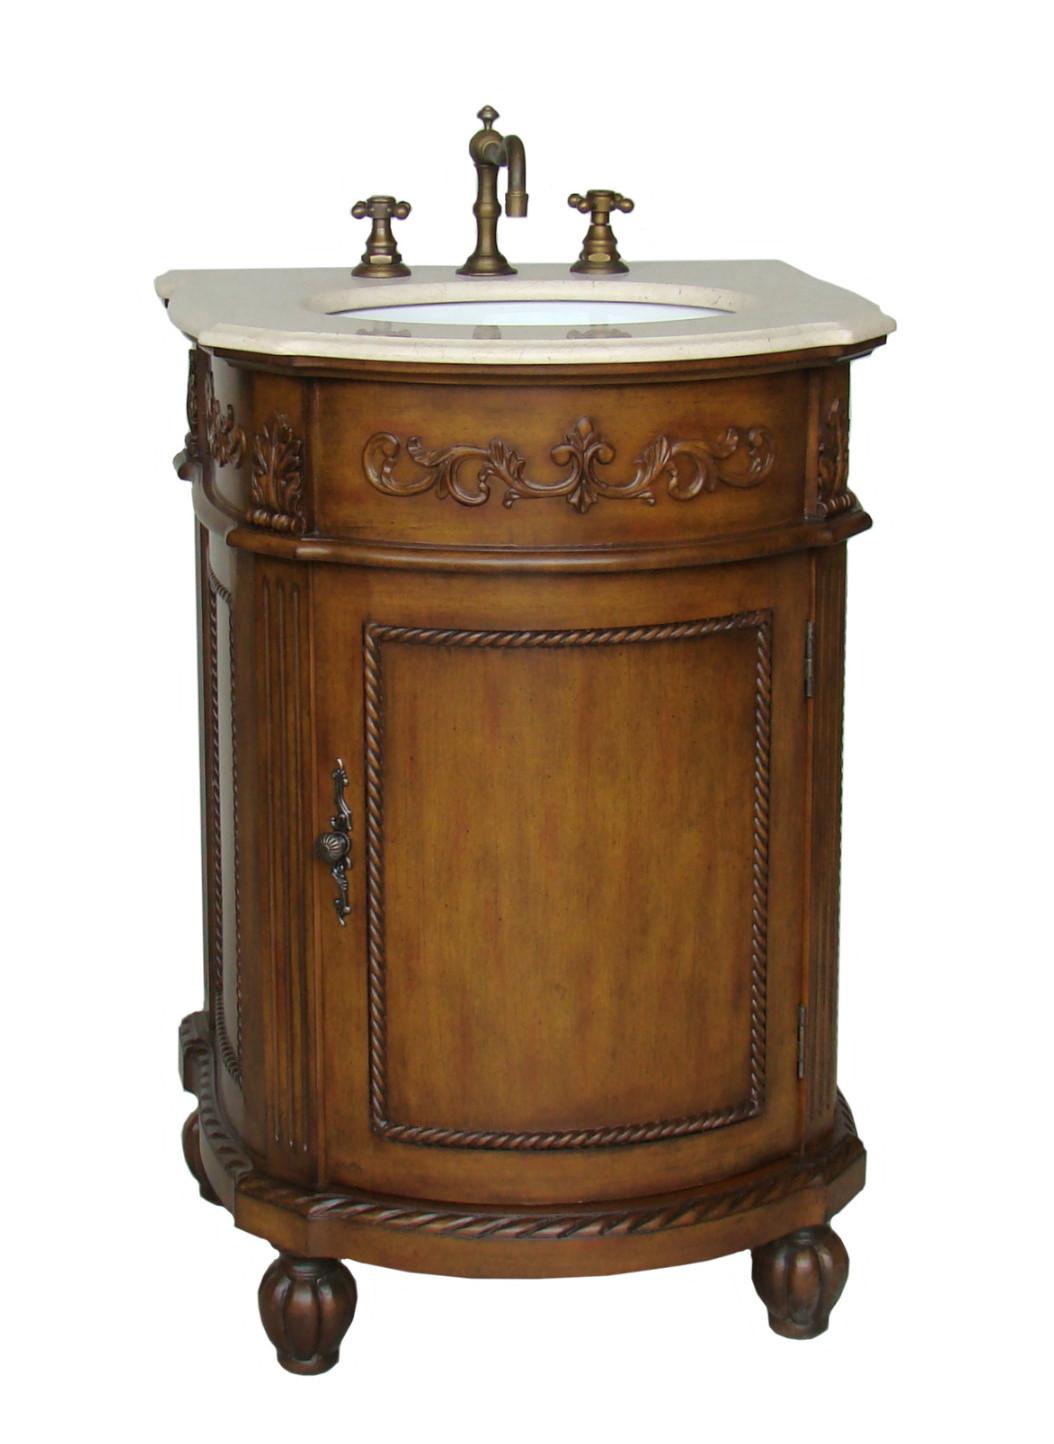 24 Inch Sink Cabinet 12 To 34 Inch Single Sink Vanities Vanity With Sink Petite